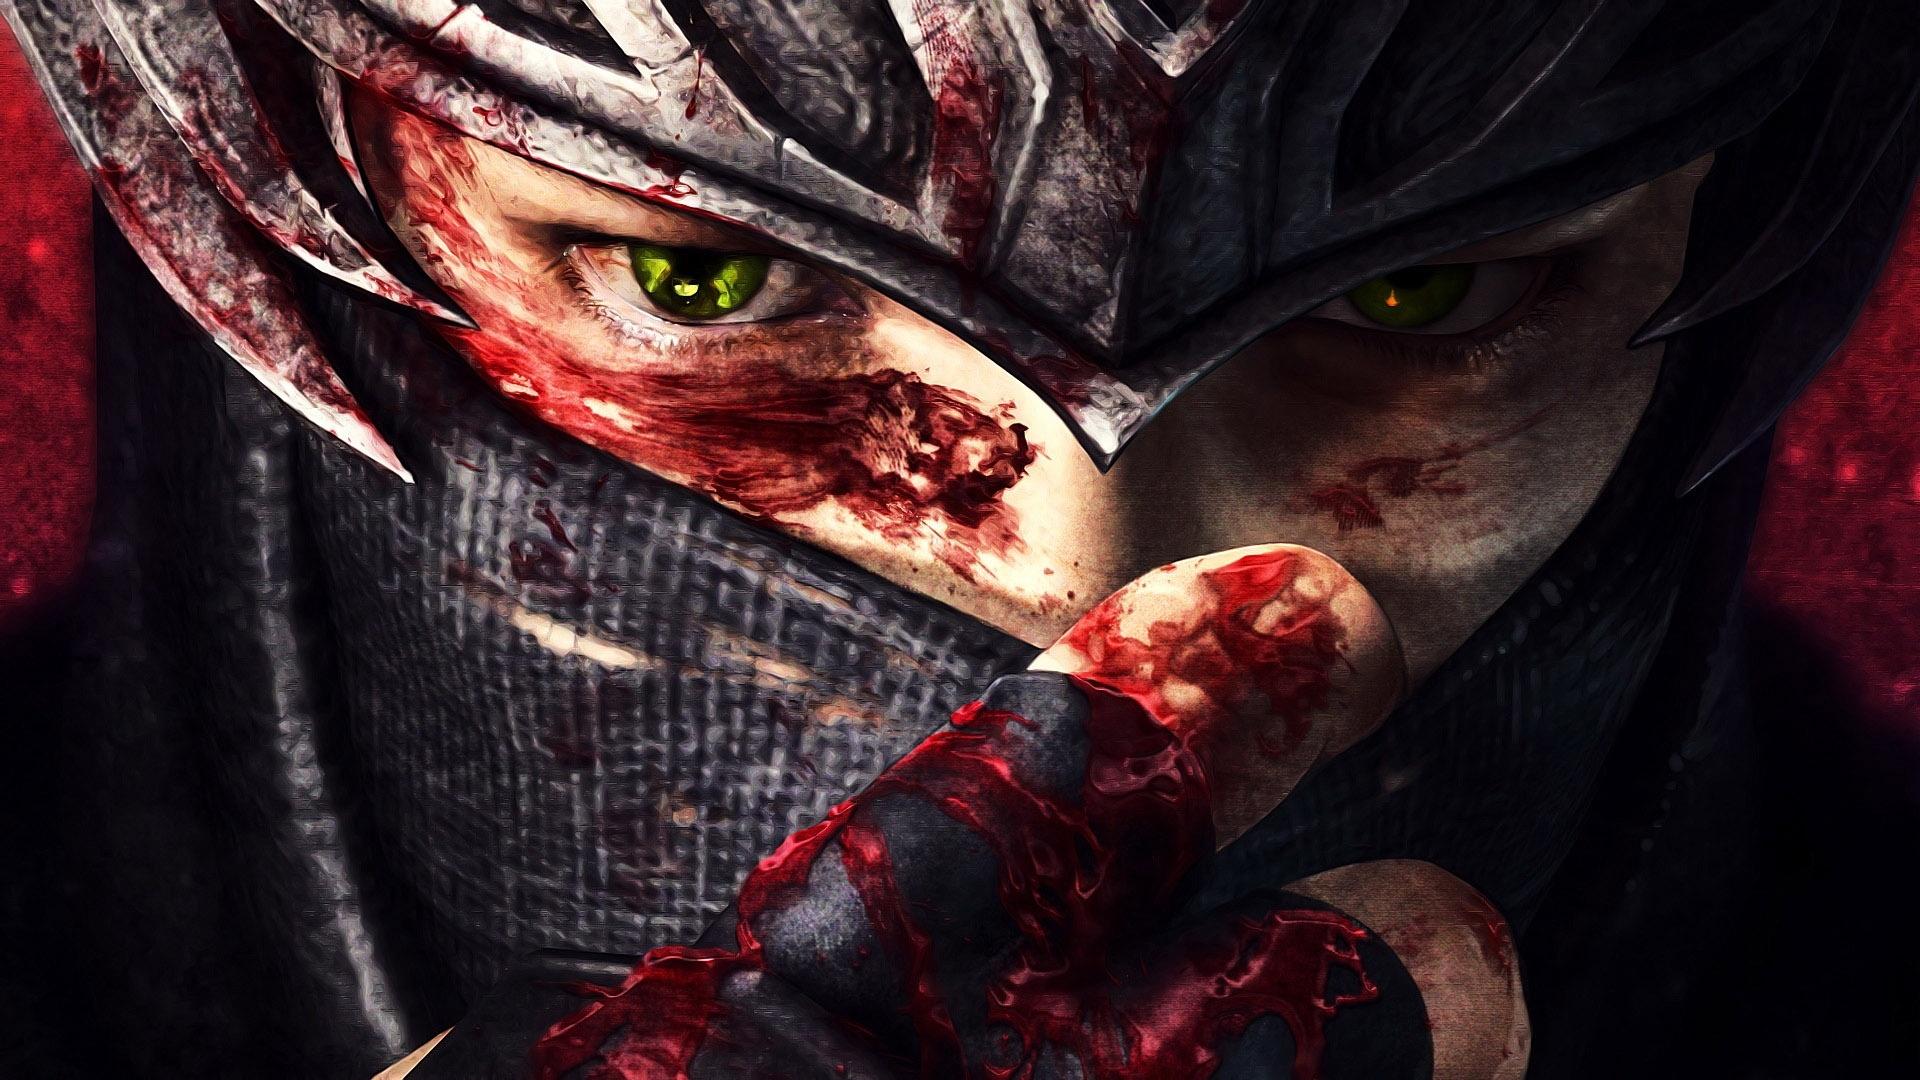 Abyss-Everything-Ninja-Gaiden-Videojuego-Ninja-Gaiden-wallpaper-wp3801710